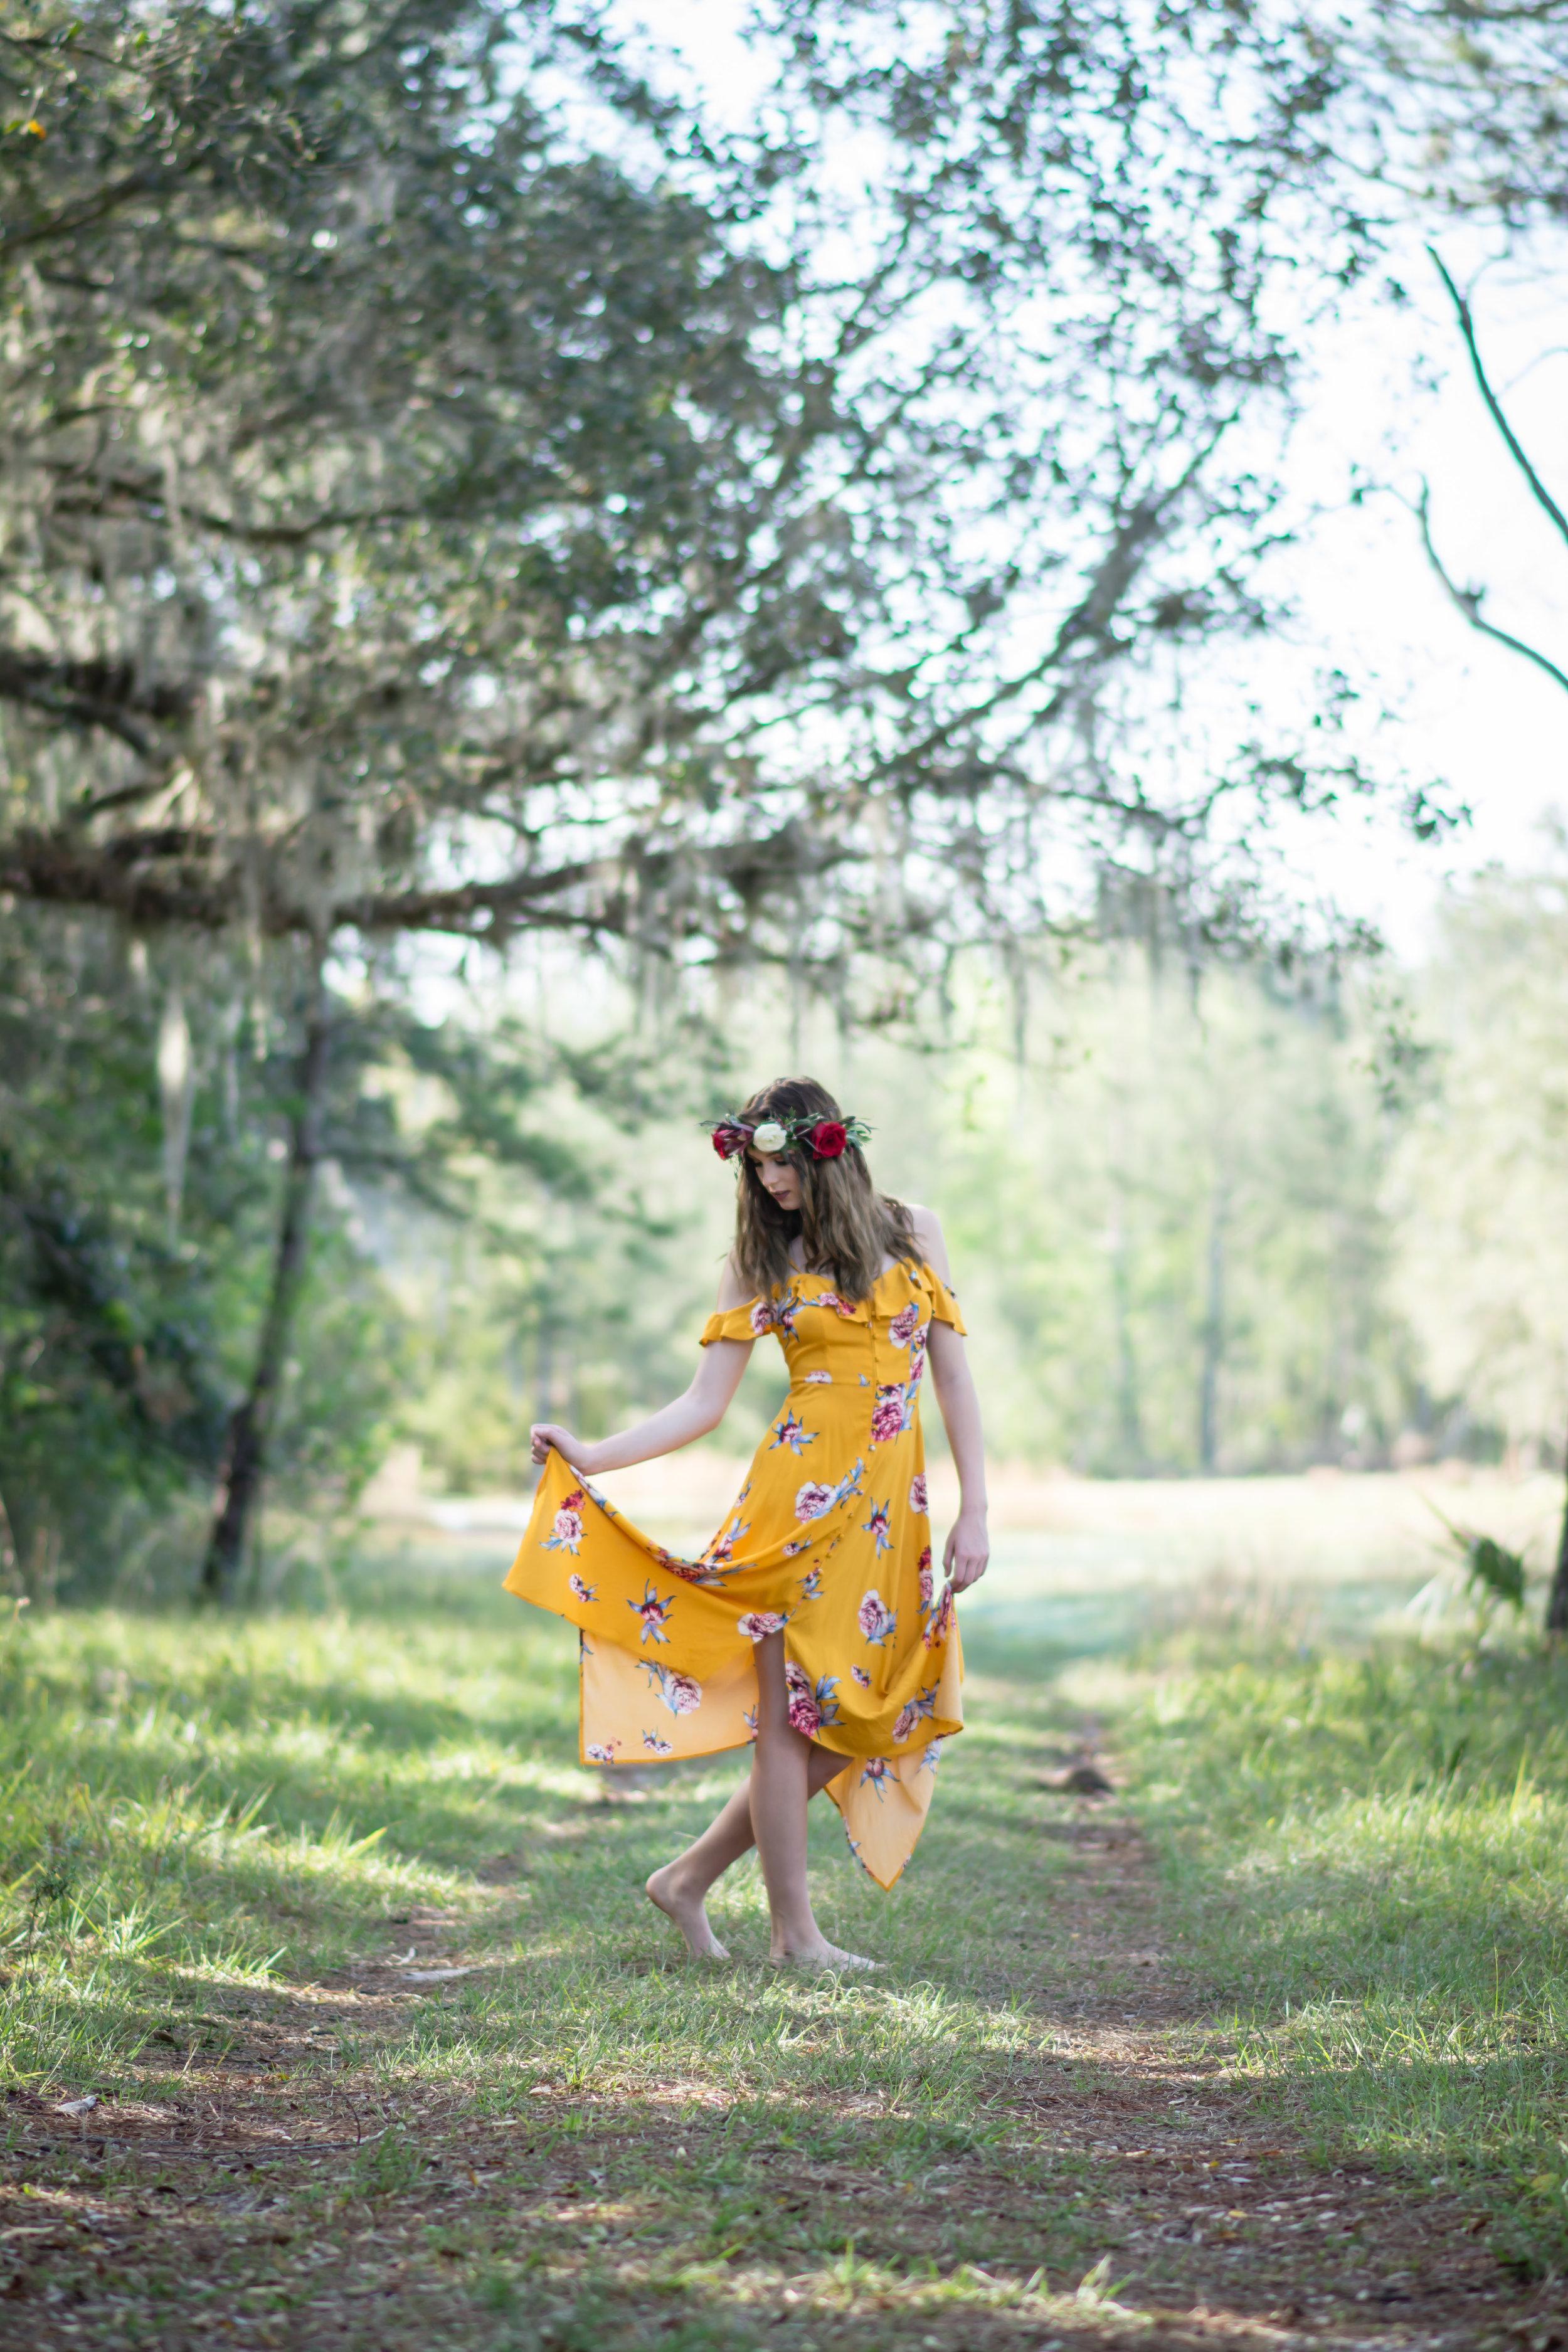 floral-headpiece-fashion-photoshoot-geneva-central-florida-photographer-yanitza-ninett-16.jpg